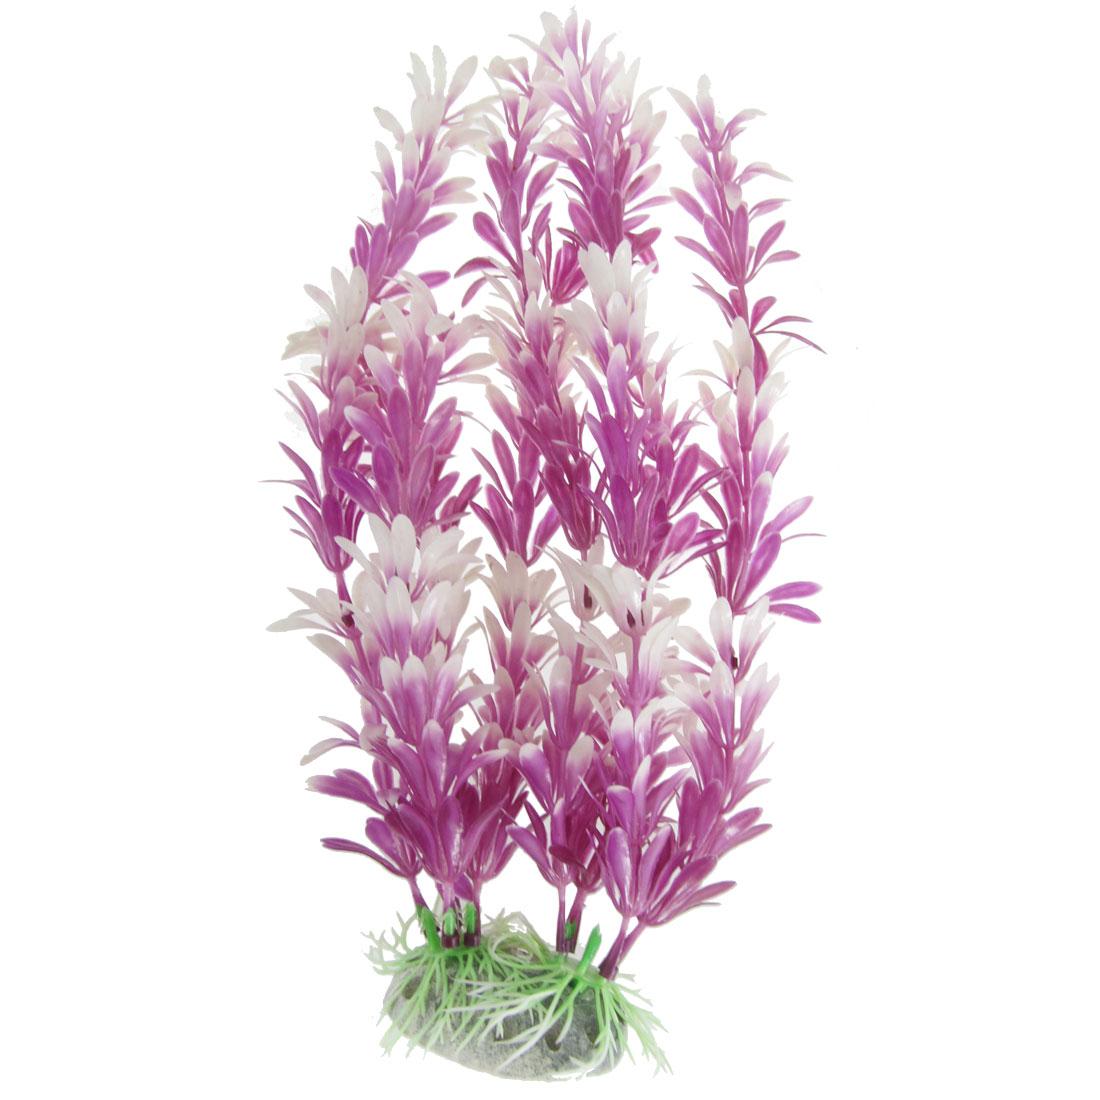 "Fish Tank Decor Ceramic Base 11.8"" Height Grass Plant Purple White"